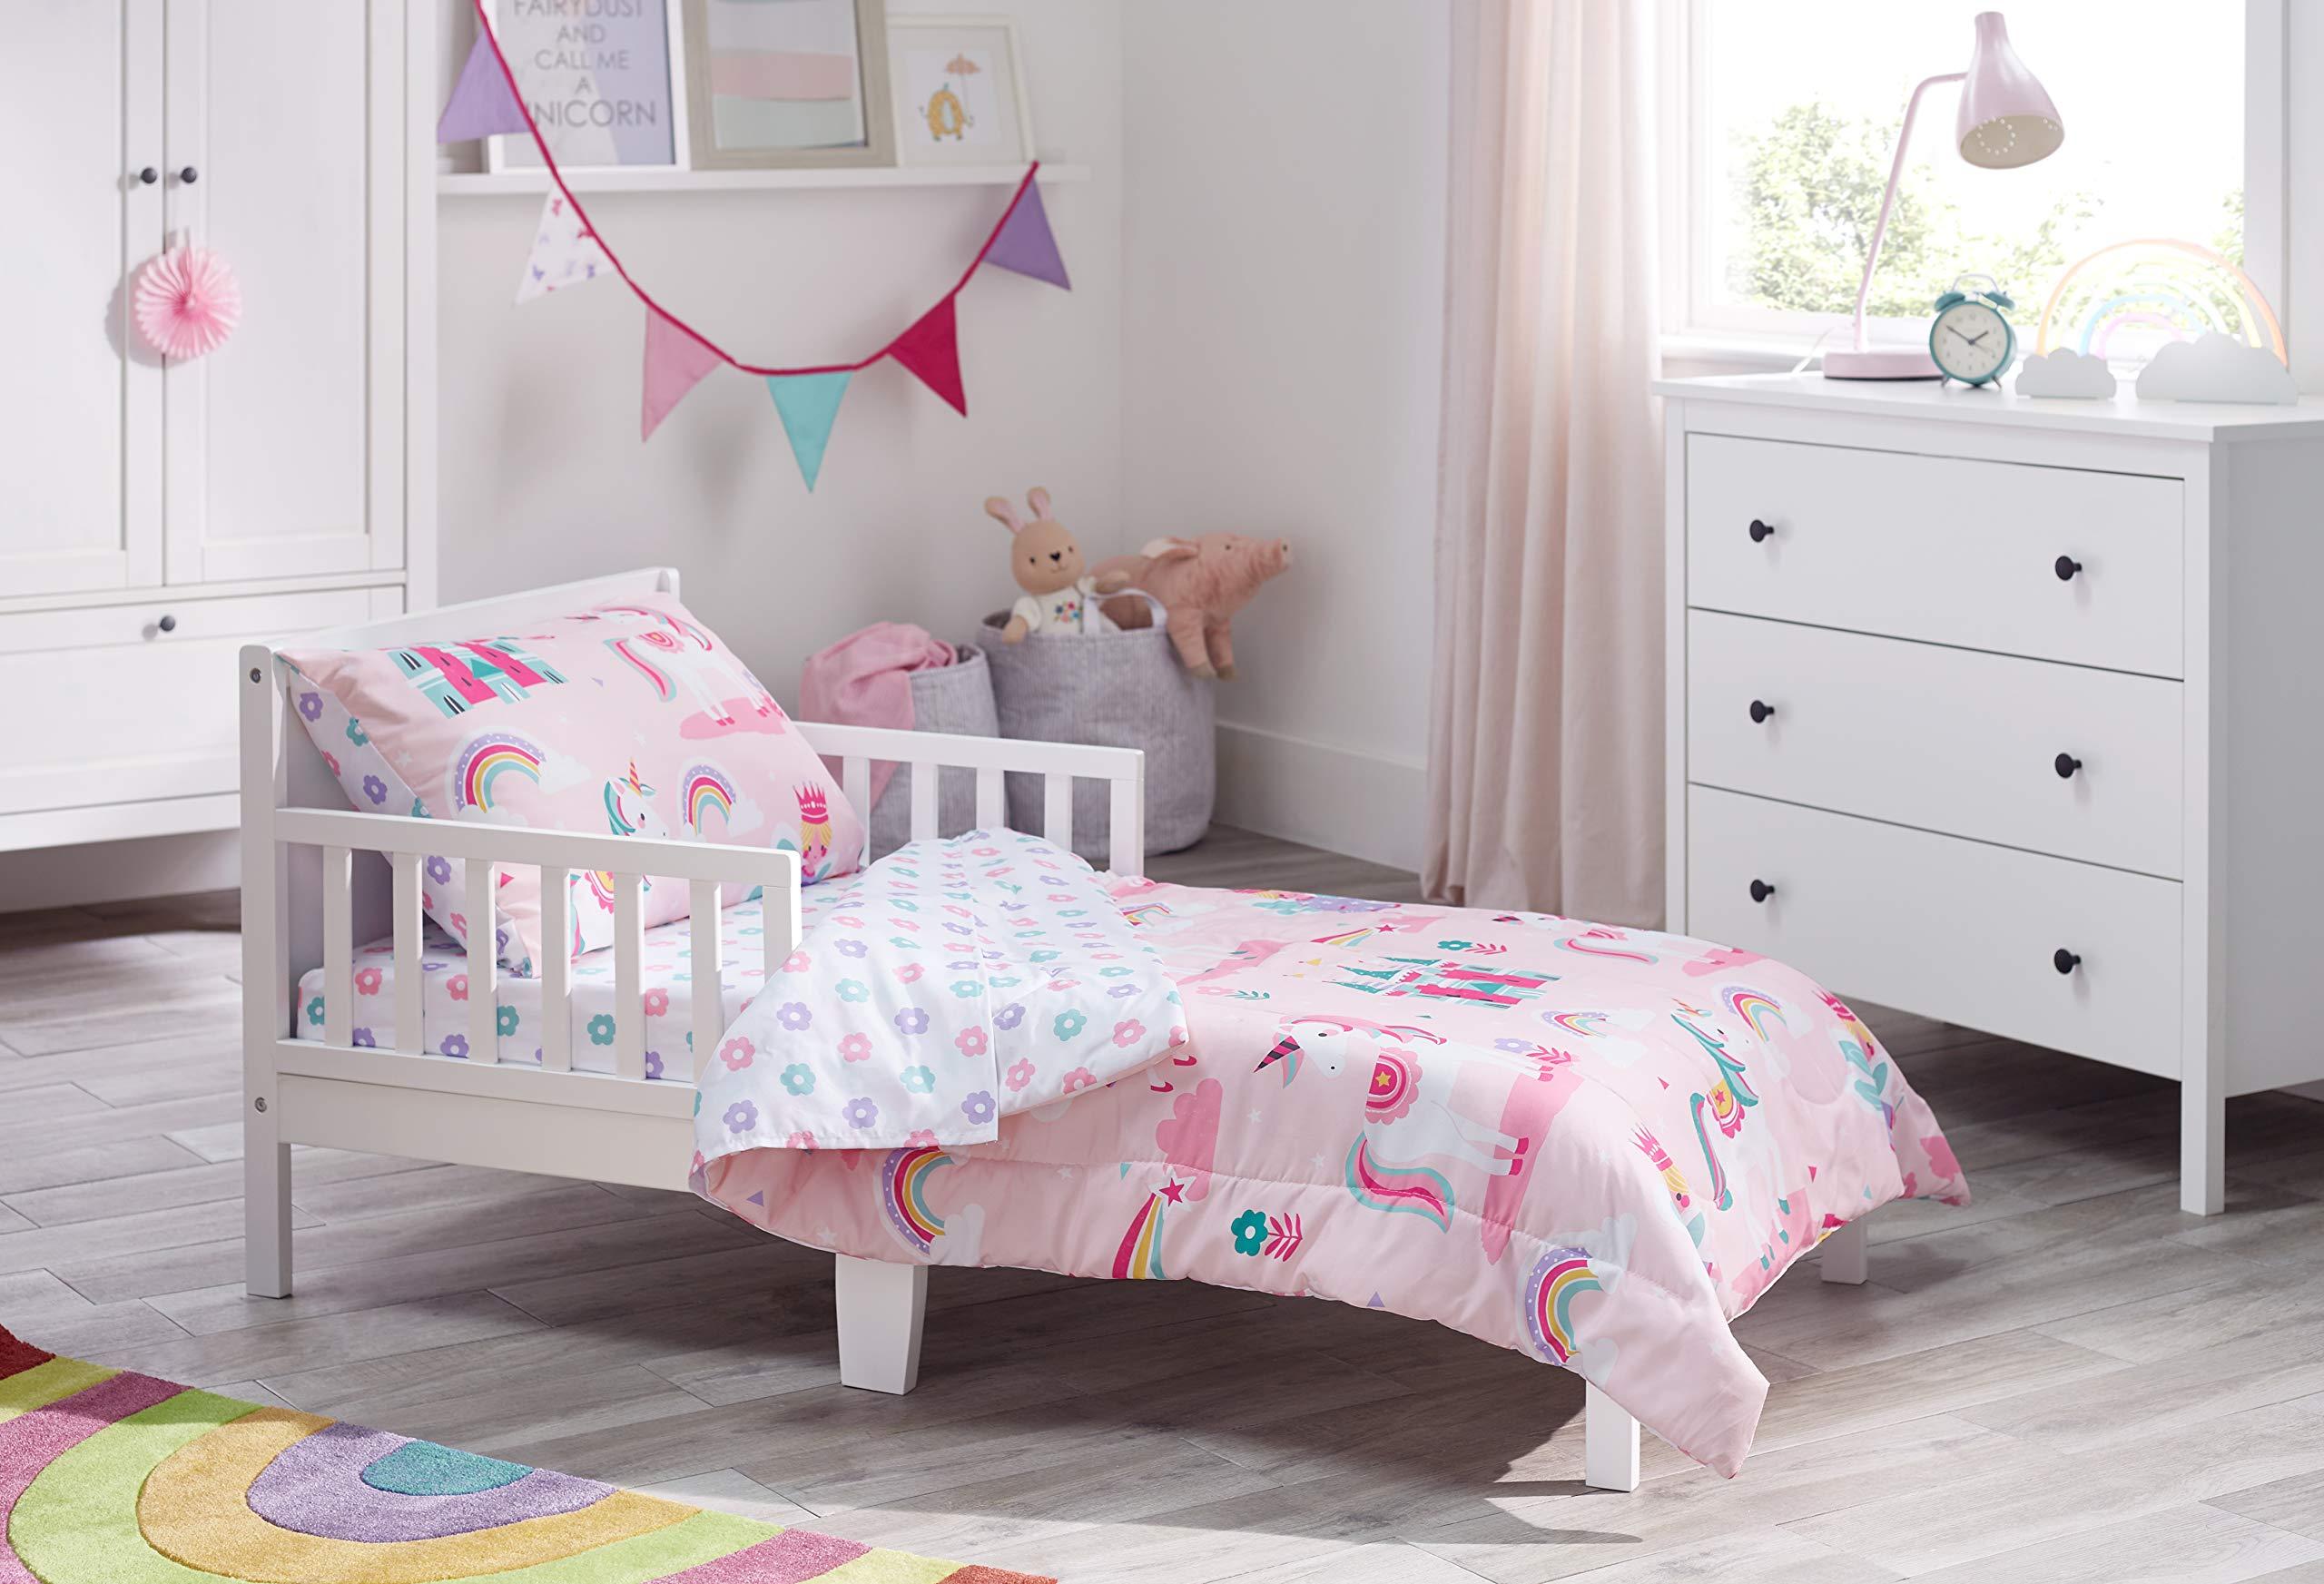 Bloomsbury Mill - 4 Piece Toddler Comforter Set - Magic Unicorn, Fairy Princess & Enchanted Castle - Pink - Kids Bedding Set by Bloomsbury Mill